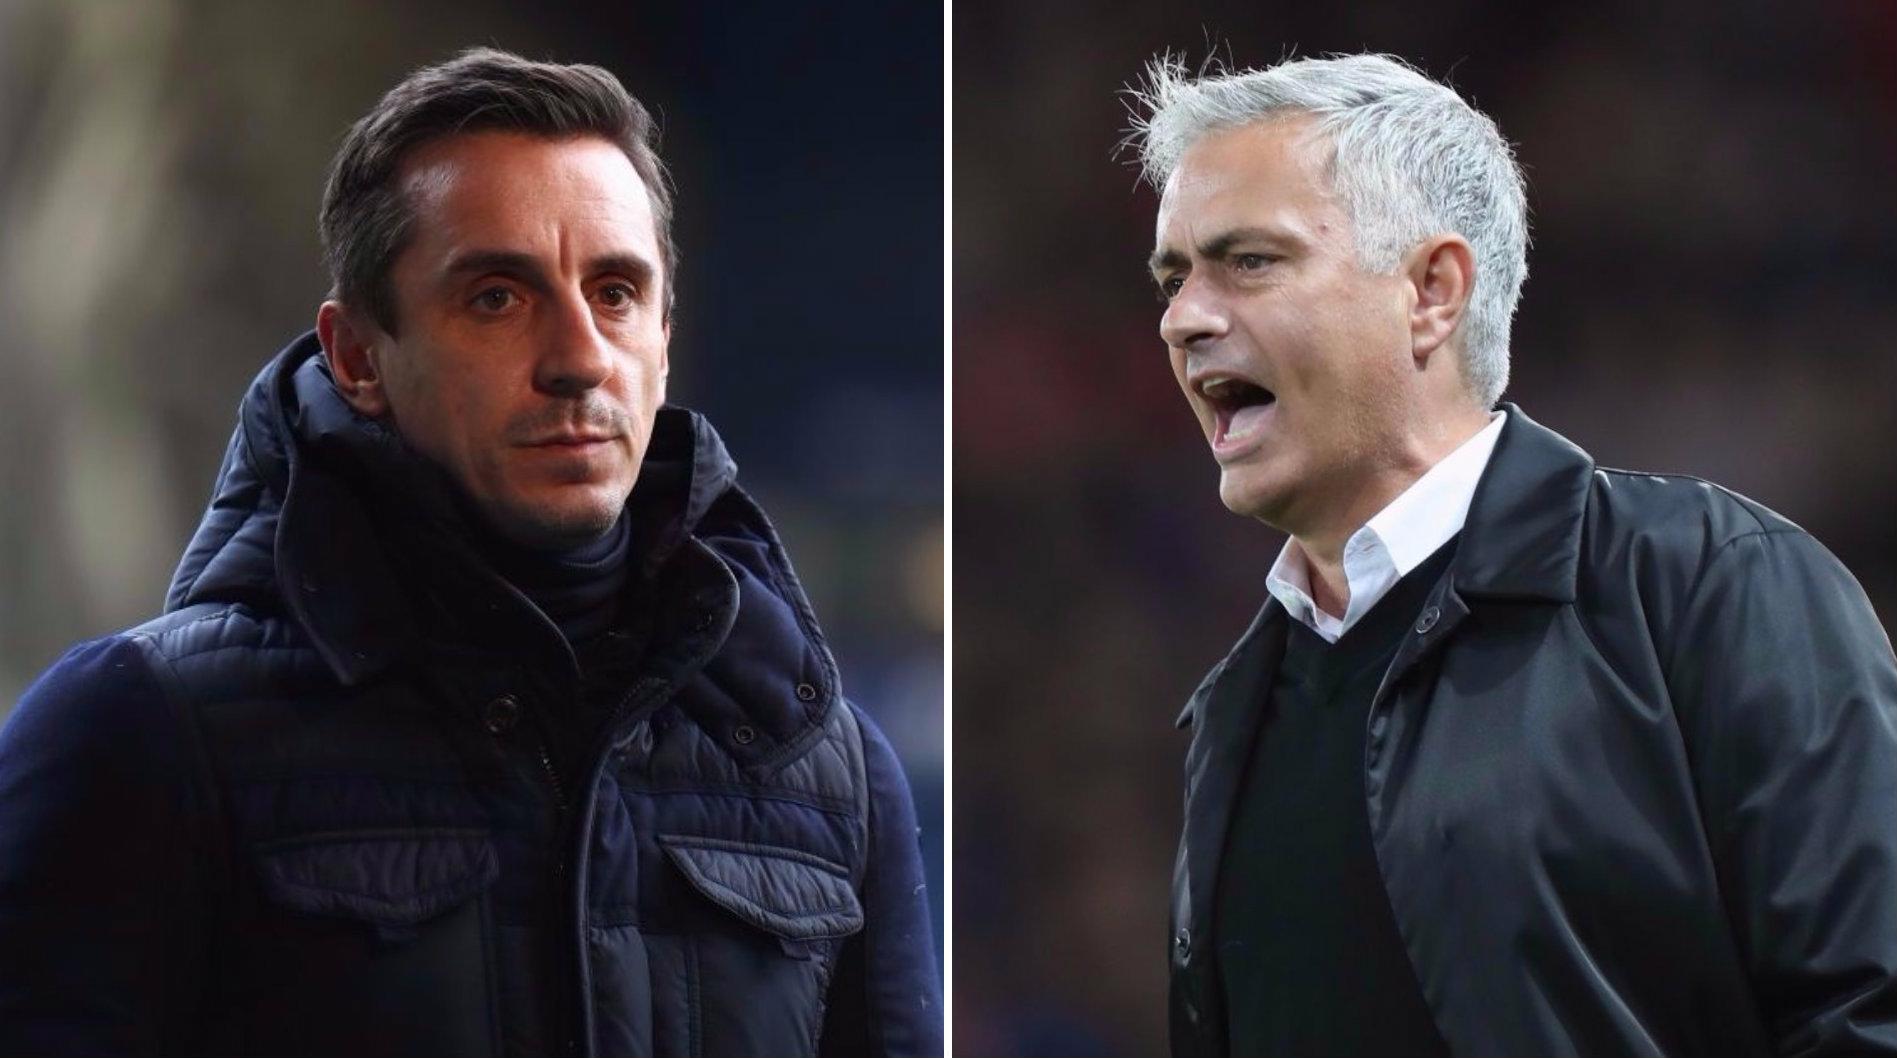 Manchester United should not sack Jose Mourinho, says Gary Neville